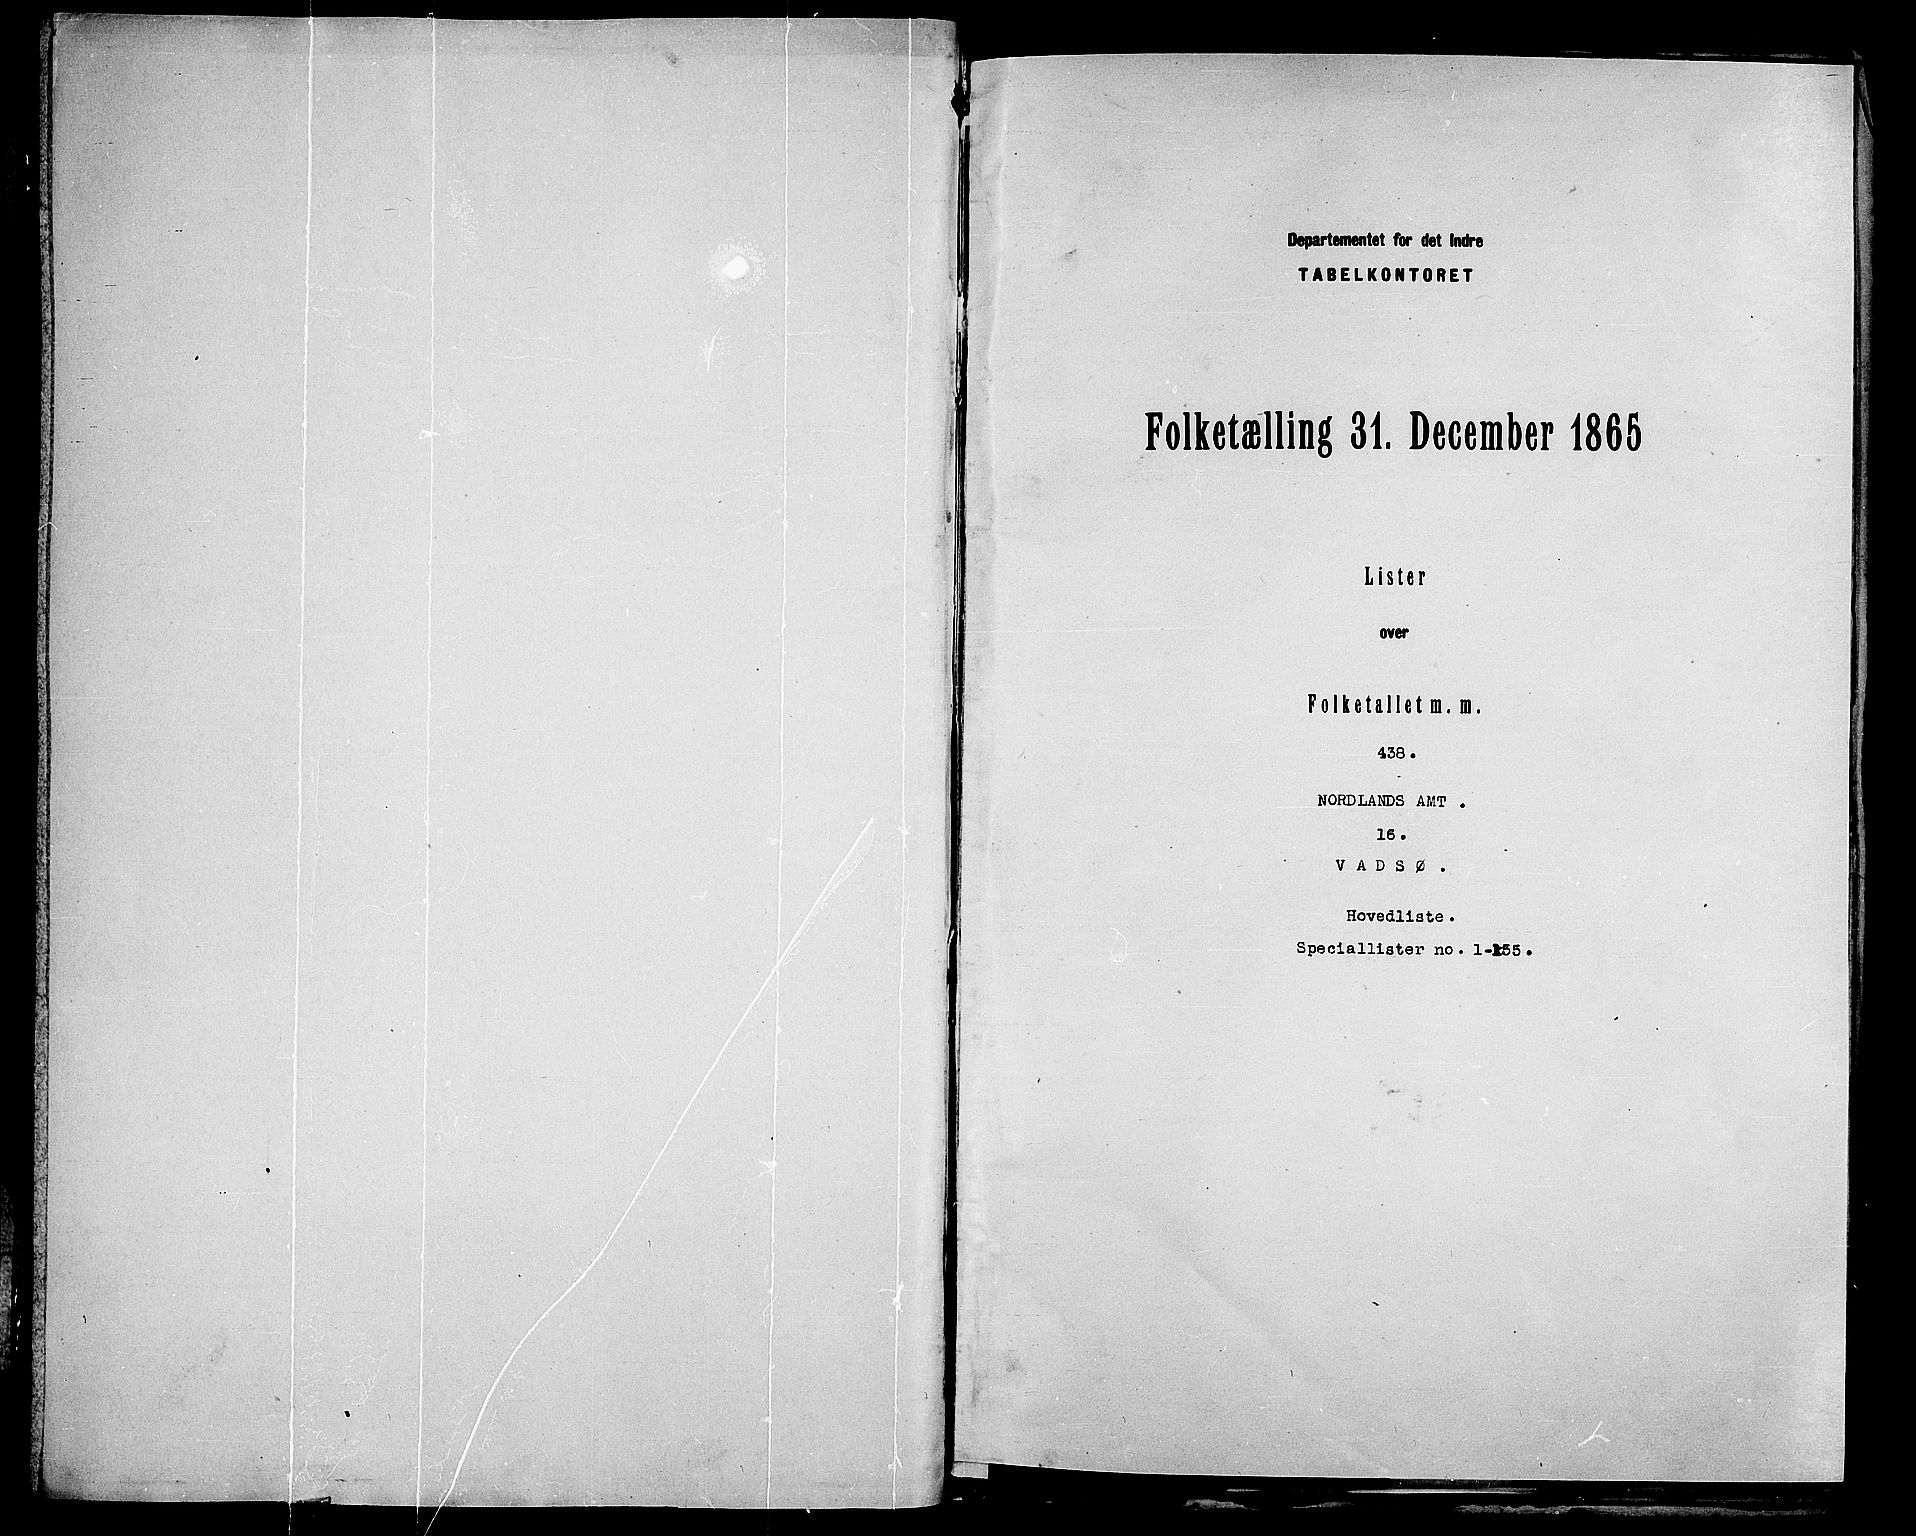 RA, Folketelling 1865 for 2003B Vadsø prestegjeld, Vadsø kjøpstad, 1865, s. 3